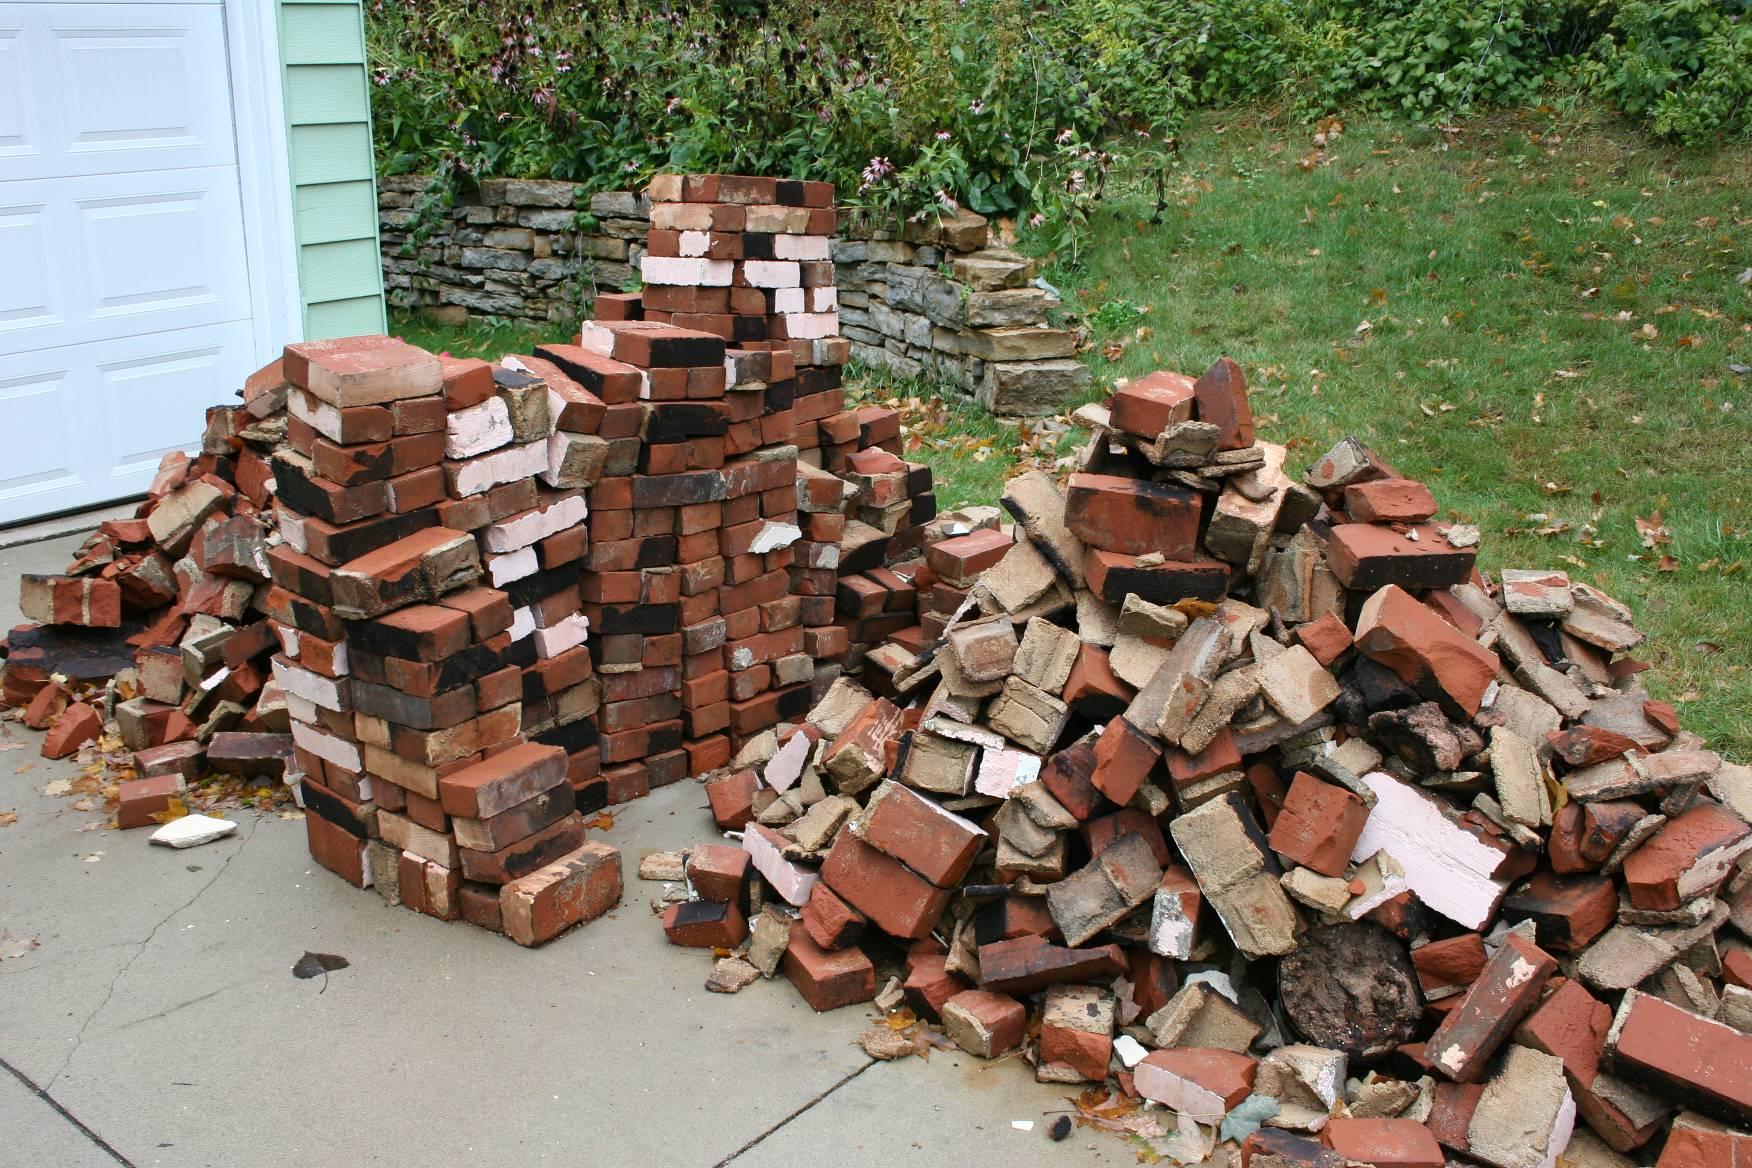 Hundreds and hundreds and hundreds of bricks, oh my ...